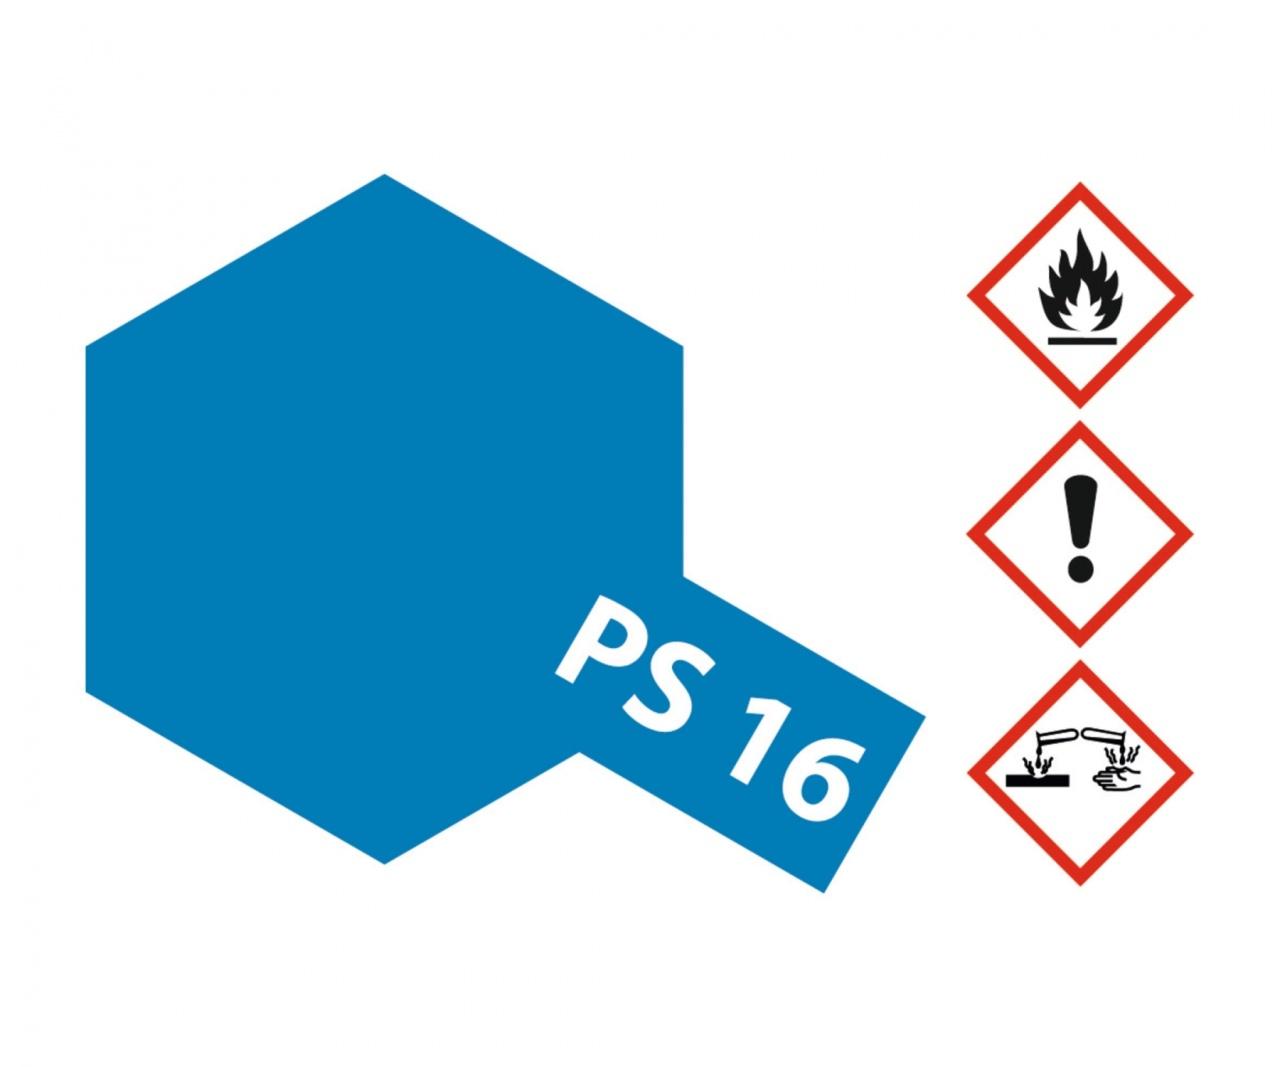 PS 16 Metallic blue